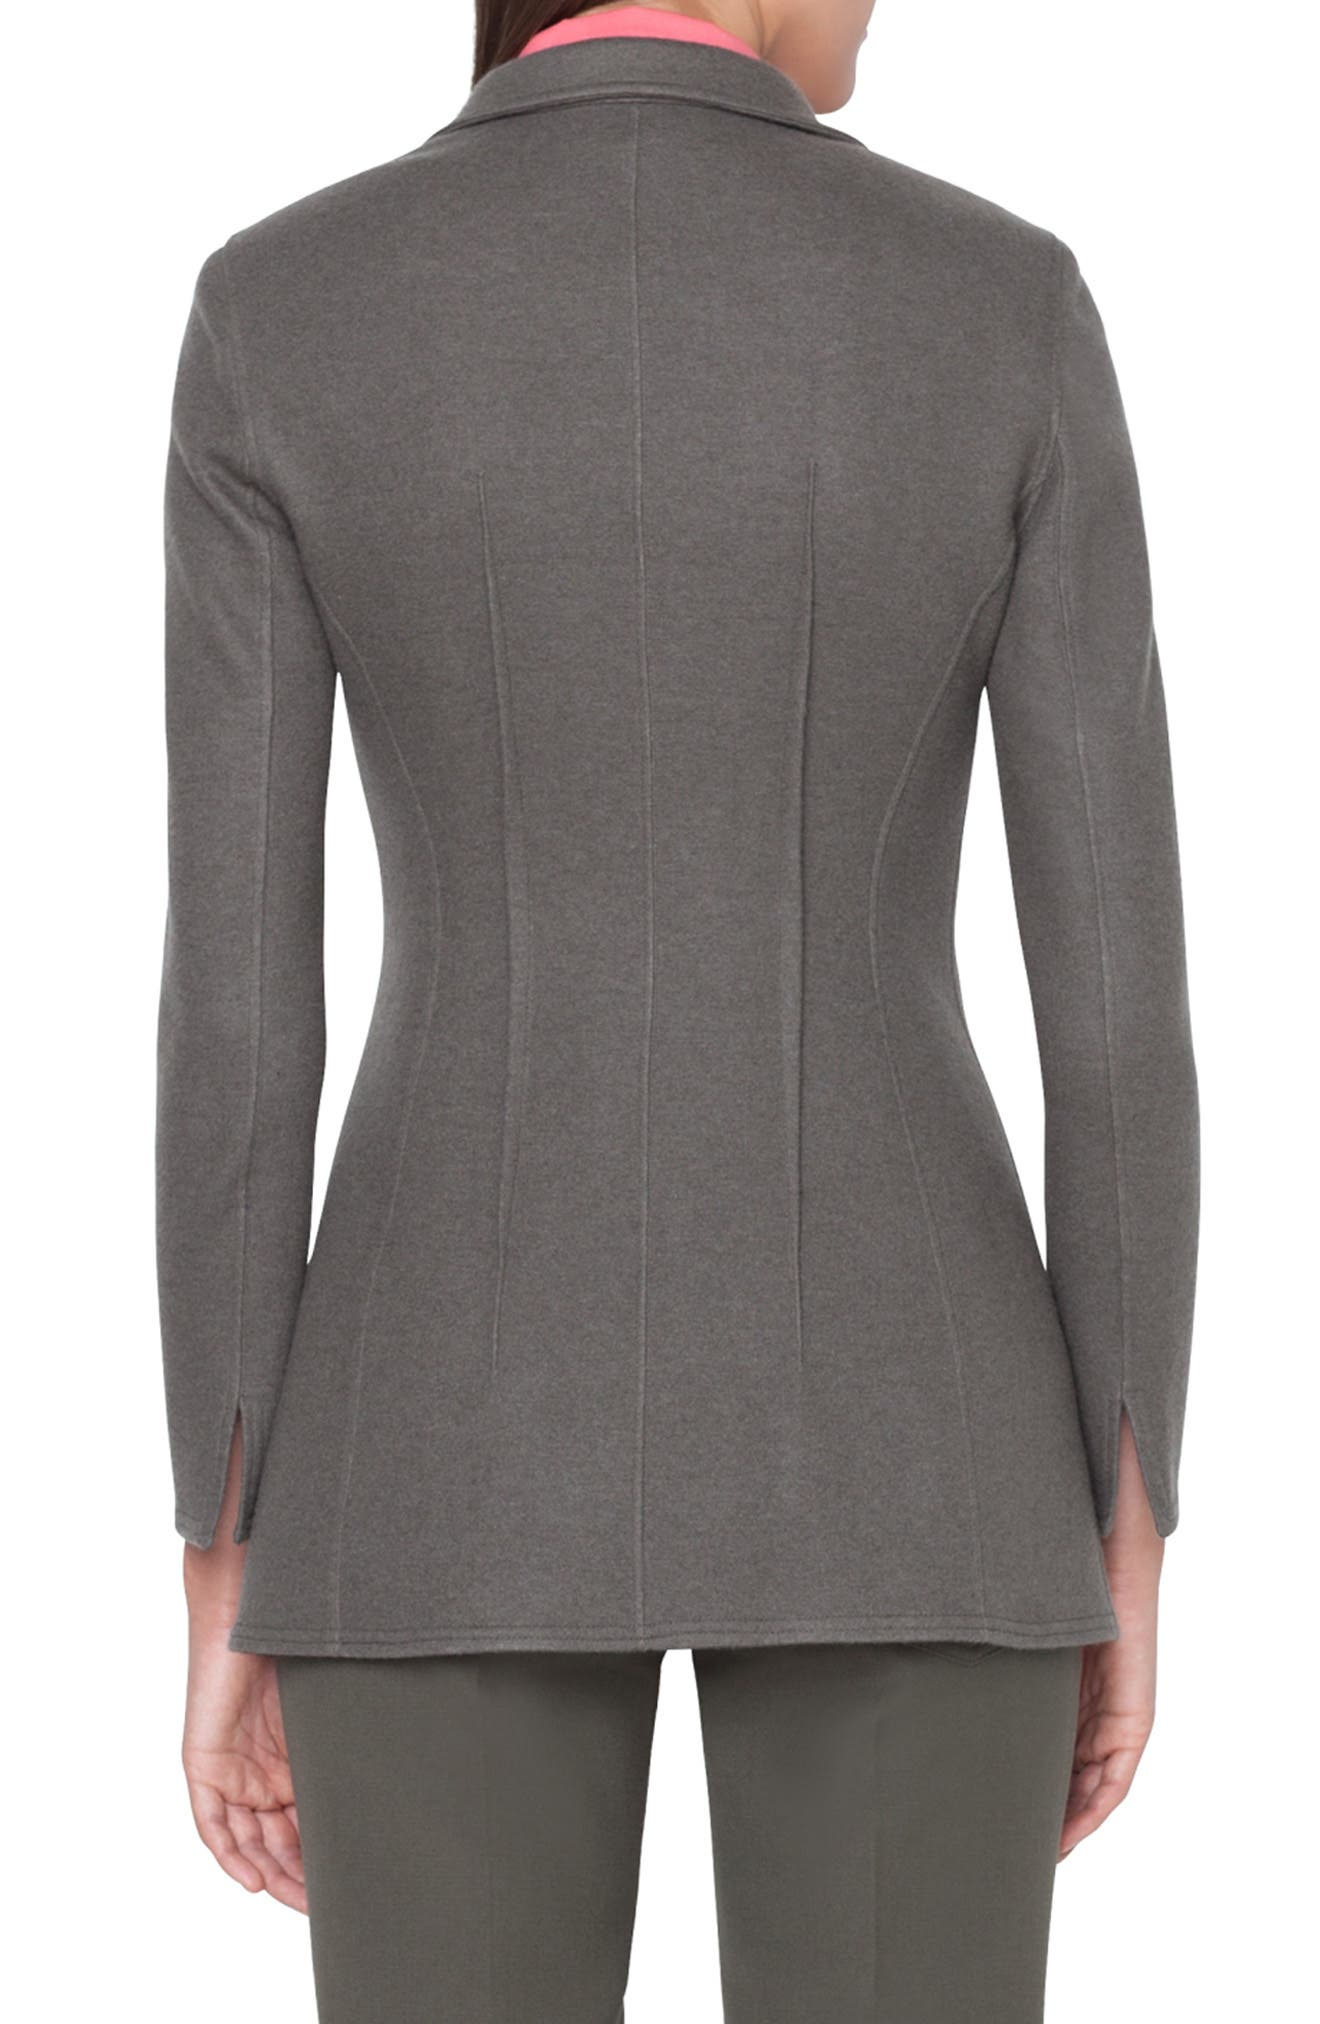 67c49d486e5 Women's Jackets Sale | Coats & Outerwear | Nordstrom